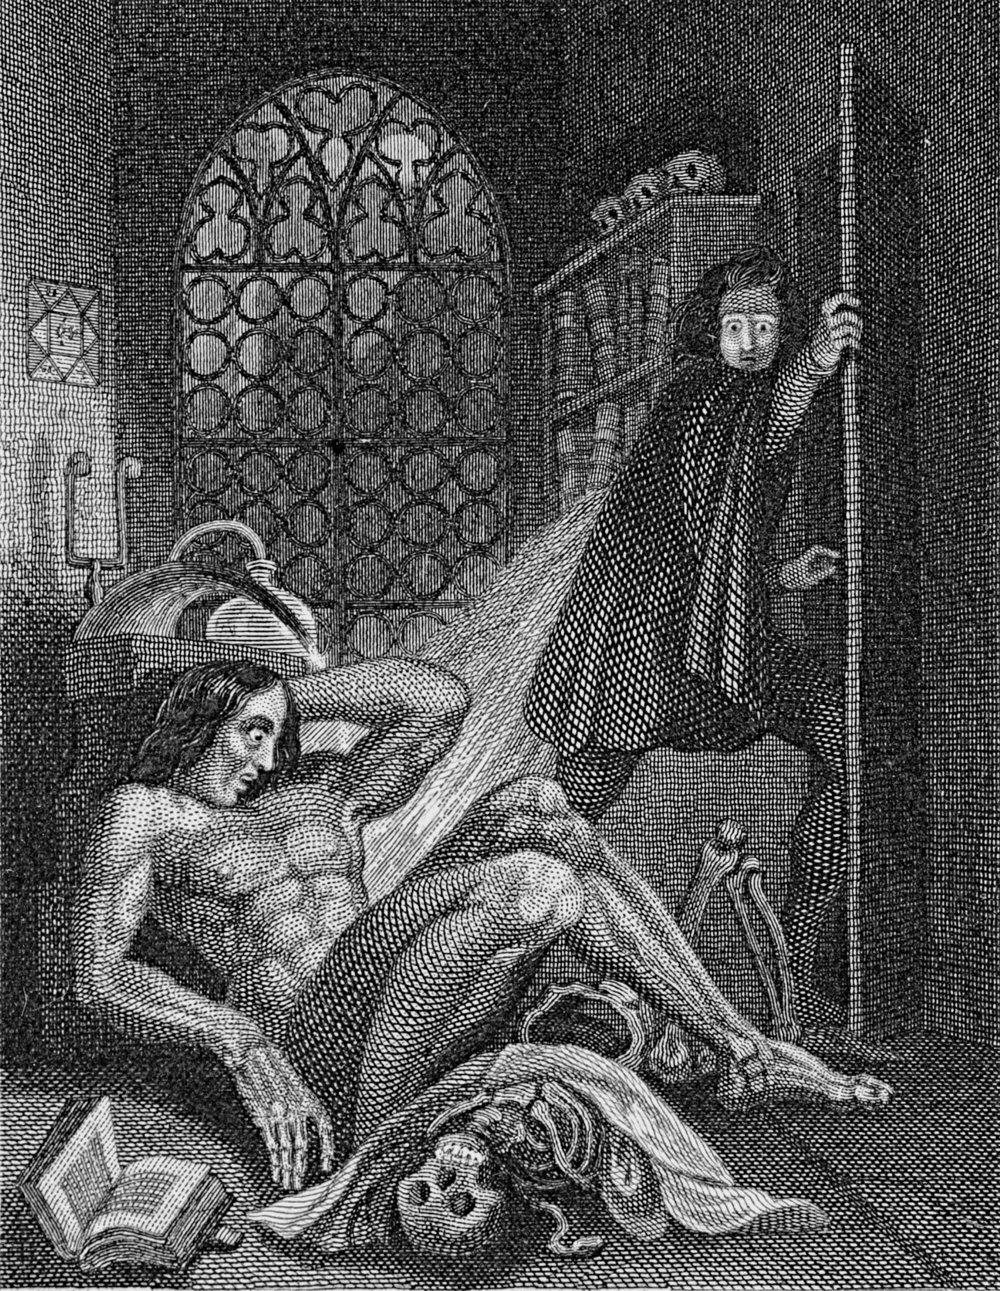 Frontis image for  Frankenstein, or the Modern Prometheus  (Revised Edition, 1831)